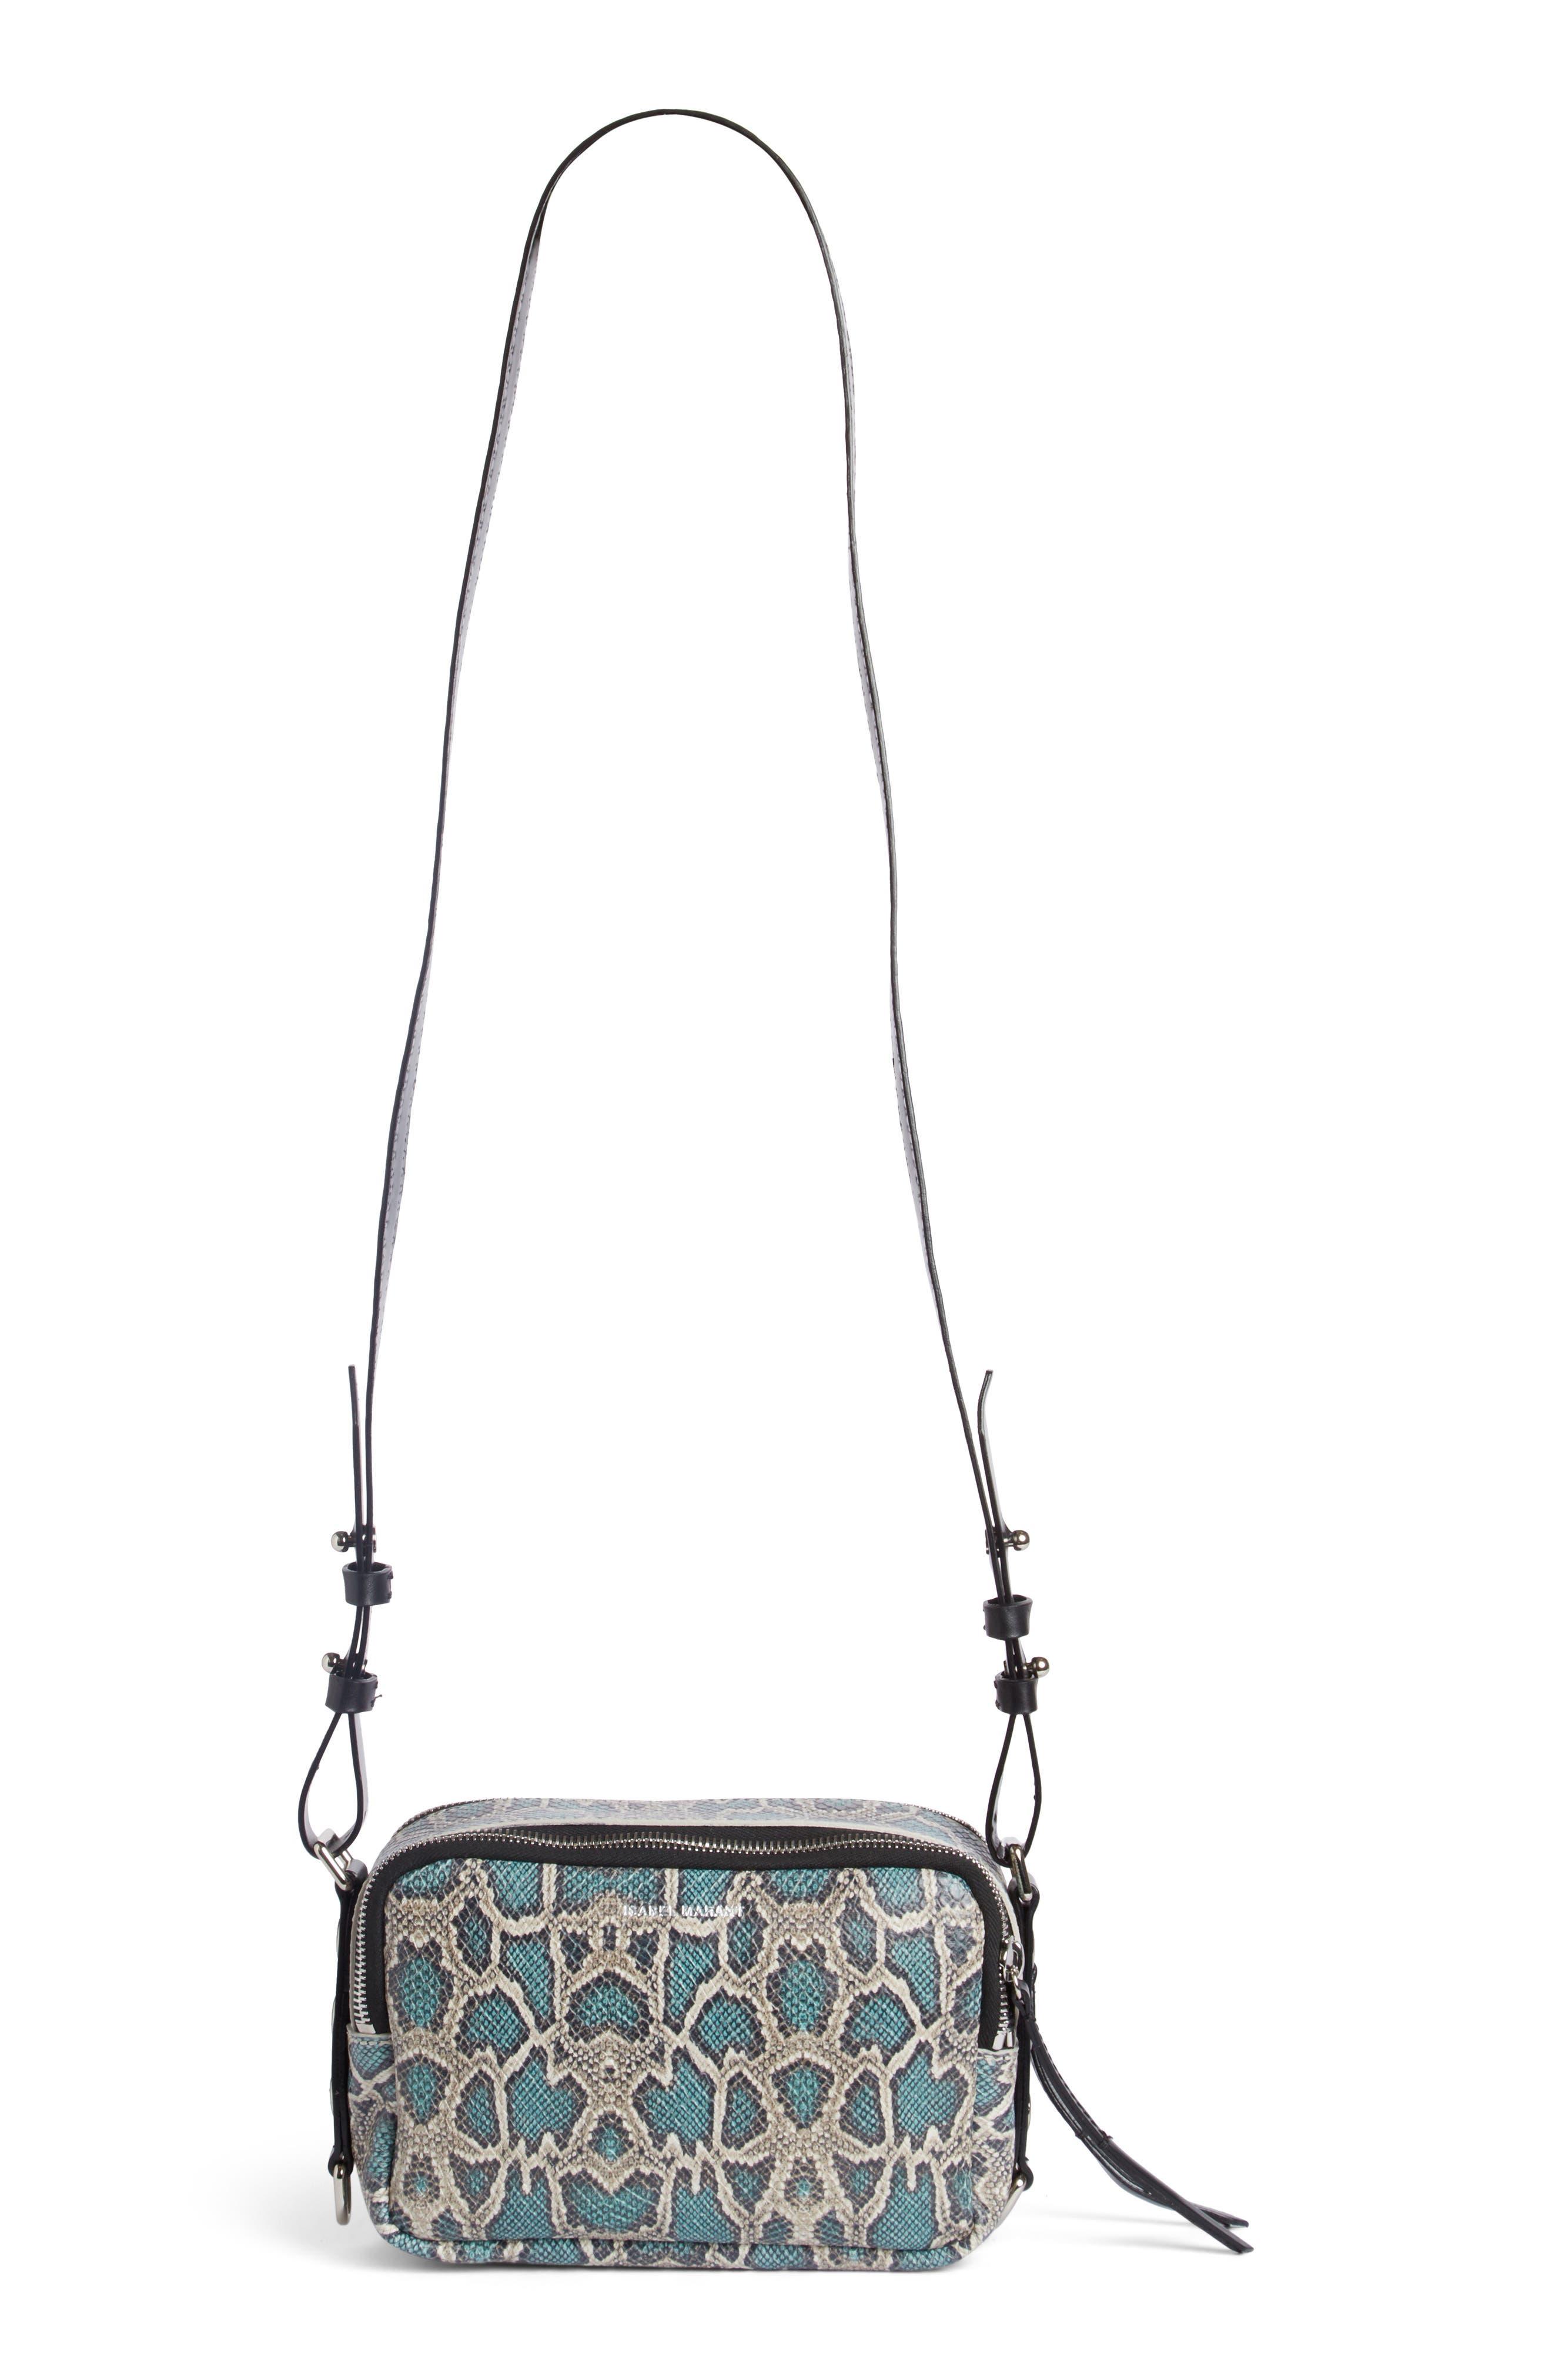 Alternate Image 1 Selected - Isabel Marant Tinley Studded Leather Crossbody Bag